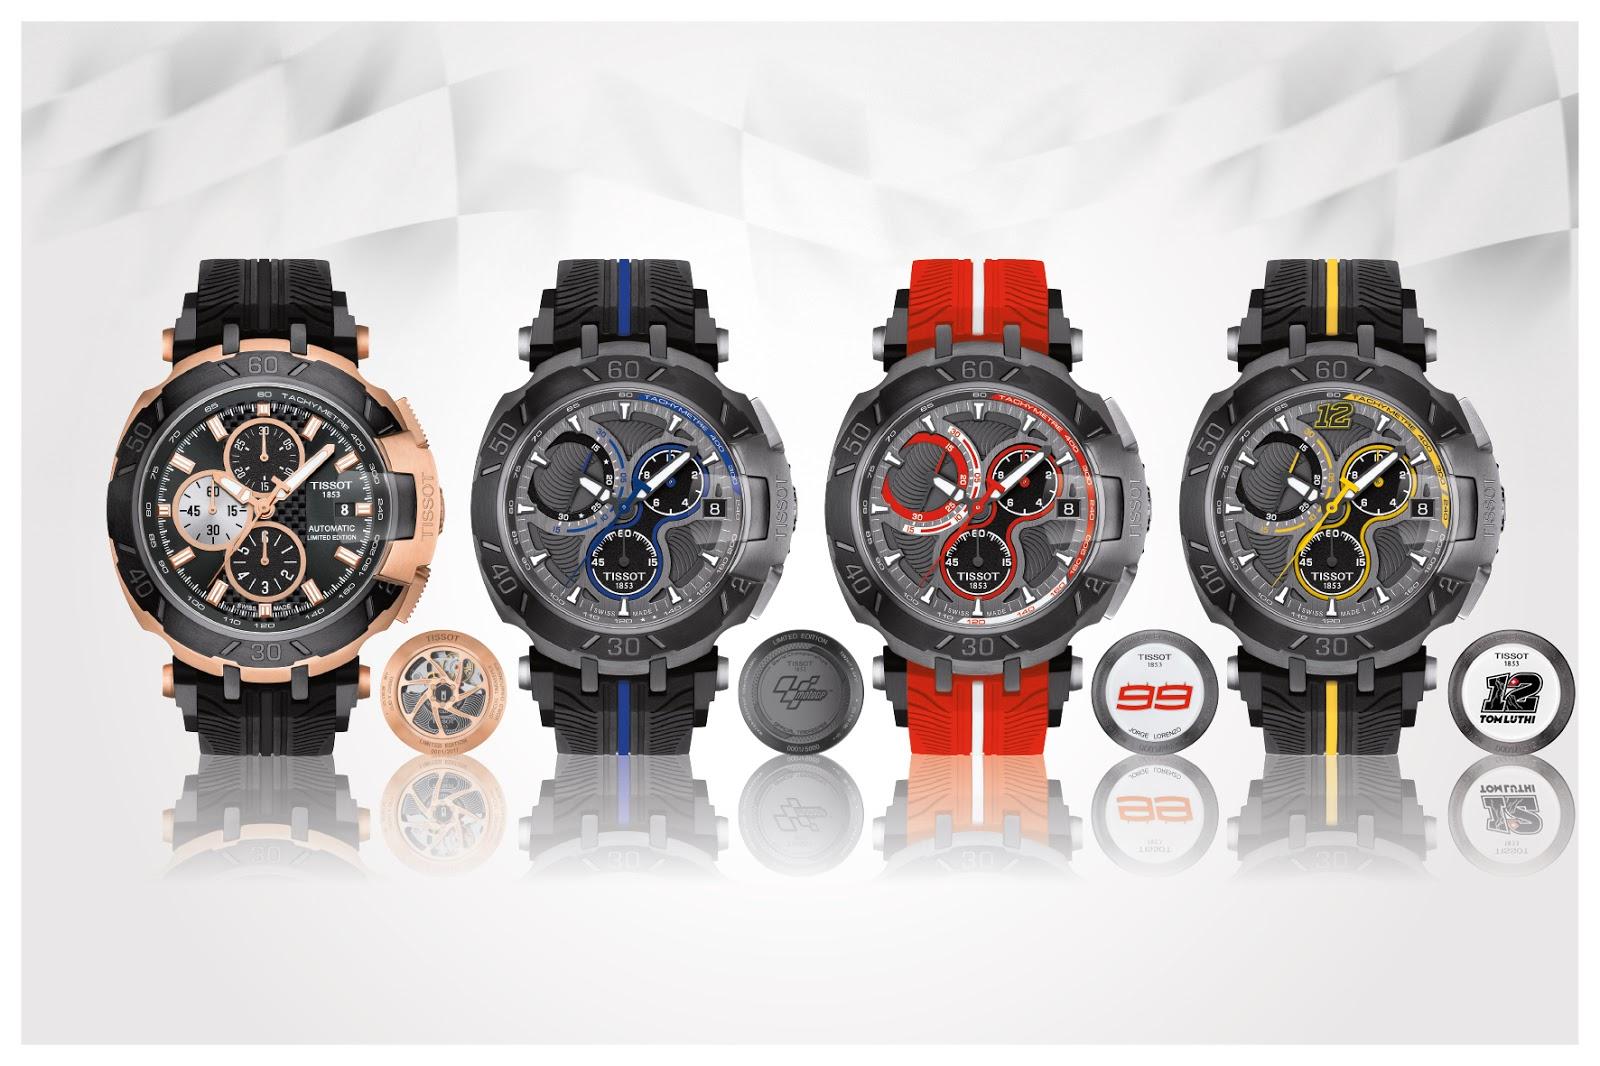 26a31d4c81b Estação Cronográfica  Relógios Tissot lançam T-Race MotoGP™ Limited ...